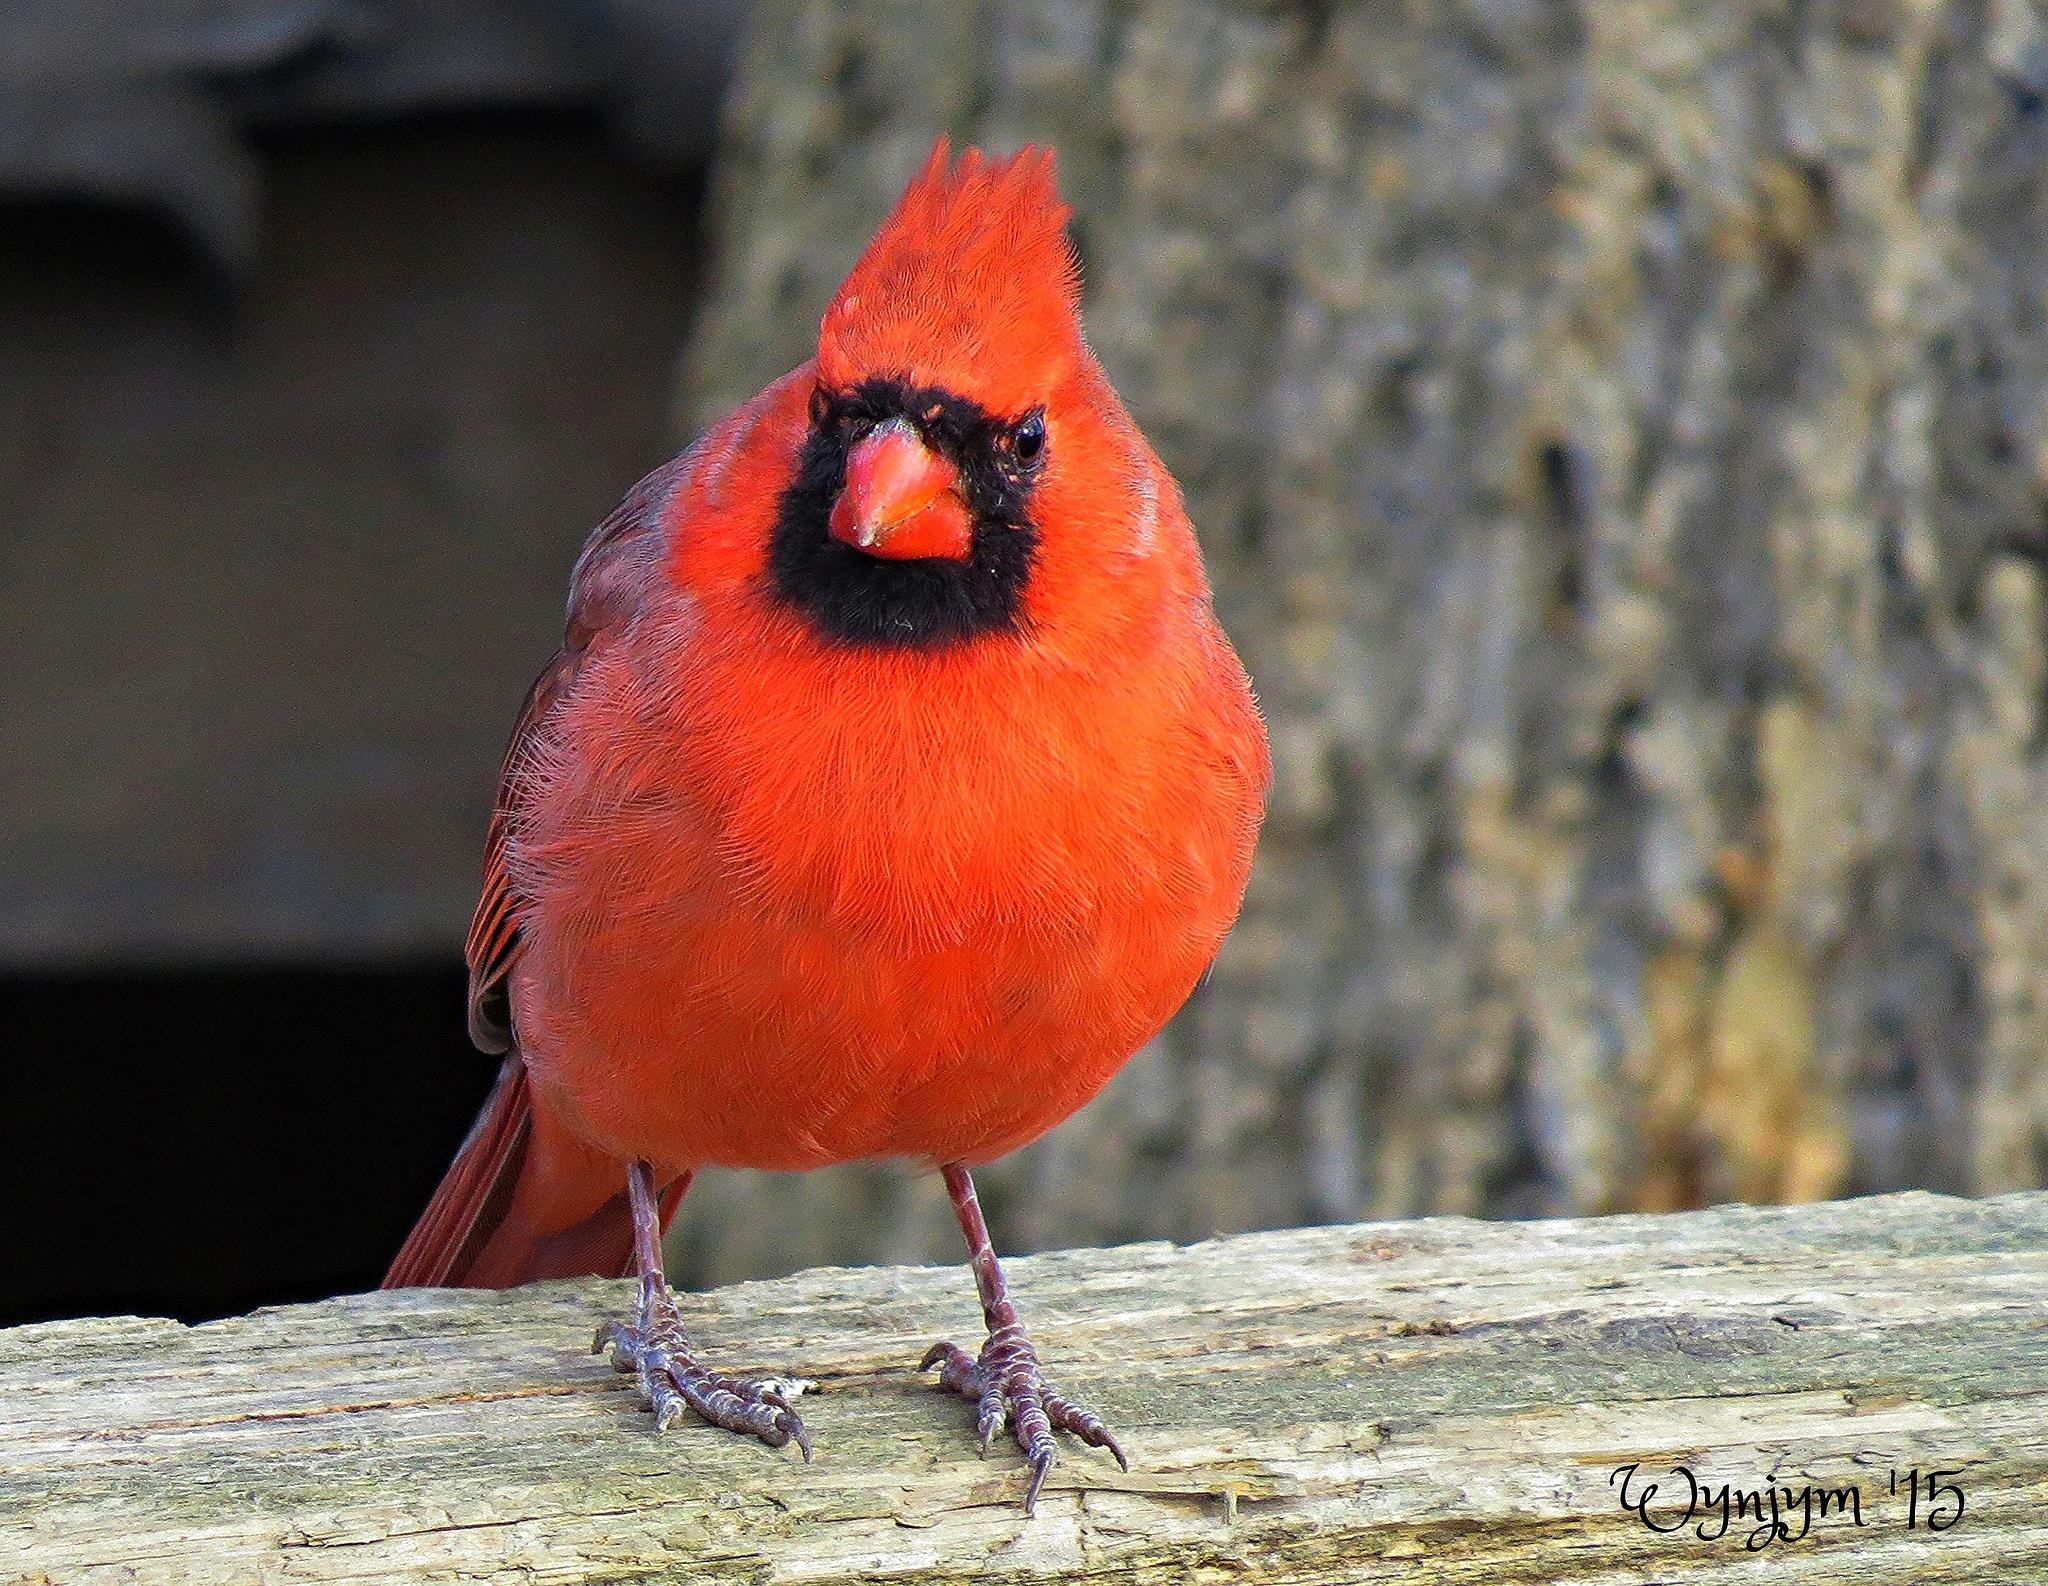 Northern Cardinal by Wynjym ChrisNP